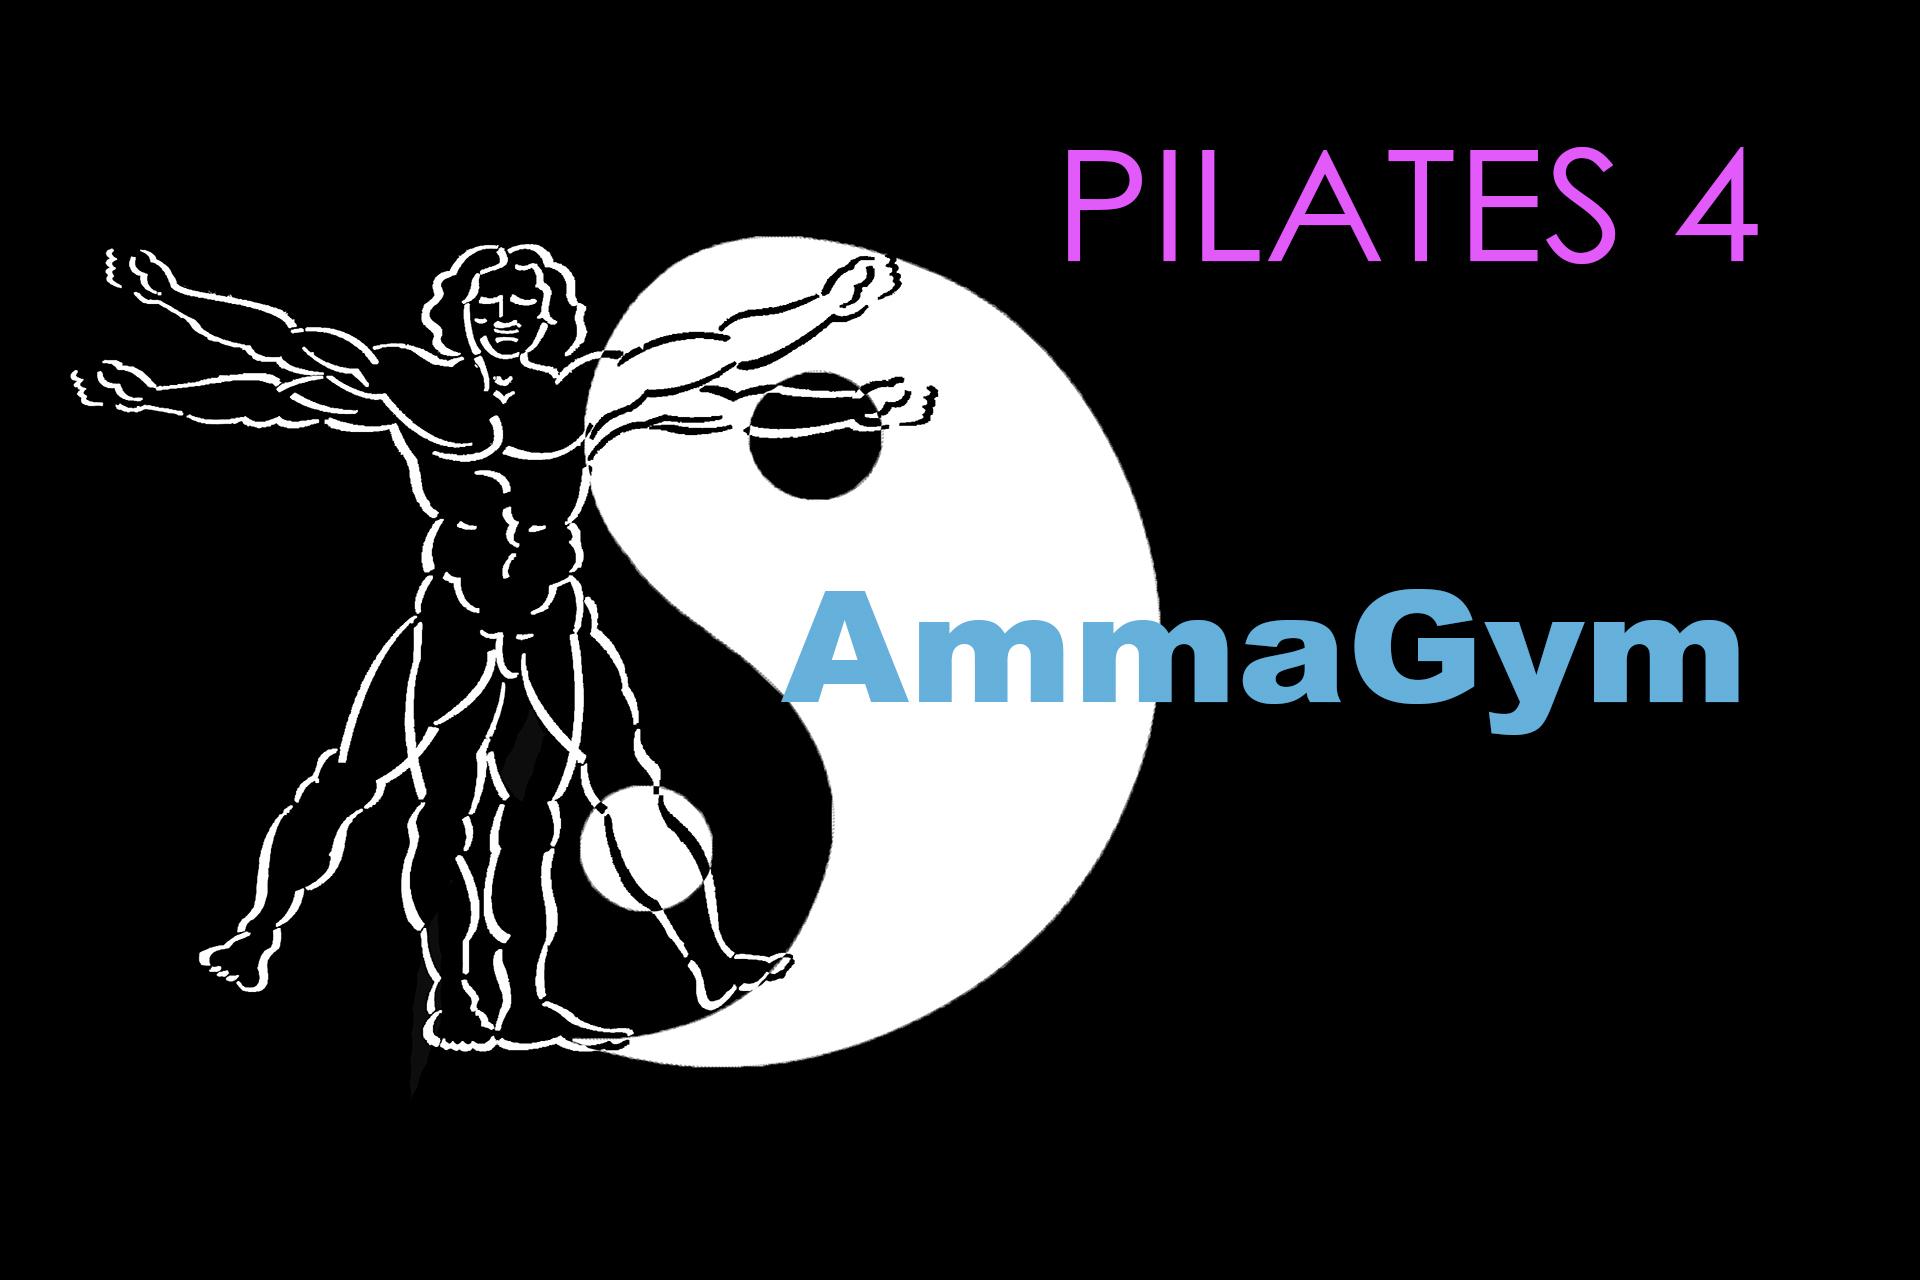 Pilates 4